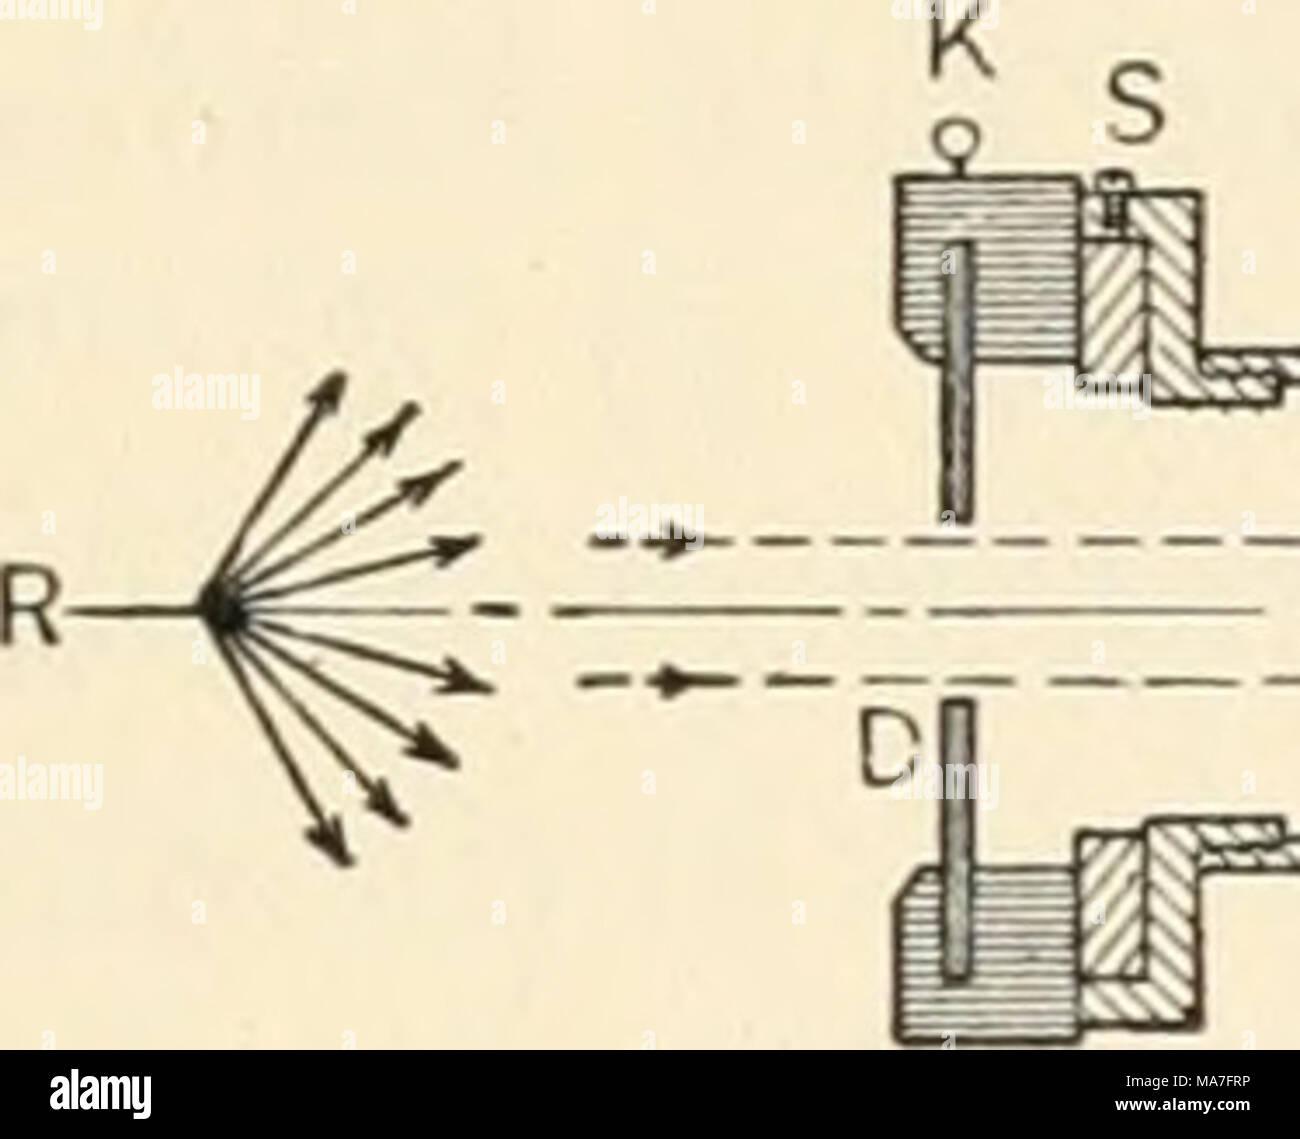 . Elementary chemical microscopy . '.'..^â ,i'.t,,', ,','.'.^,v ', .â lvyl'.','.',r' v ' ' ^ 11 ' ' i 'A  jn^l. Fig. 34. Nachet Vertical Illuminator. - Stock Image